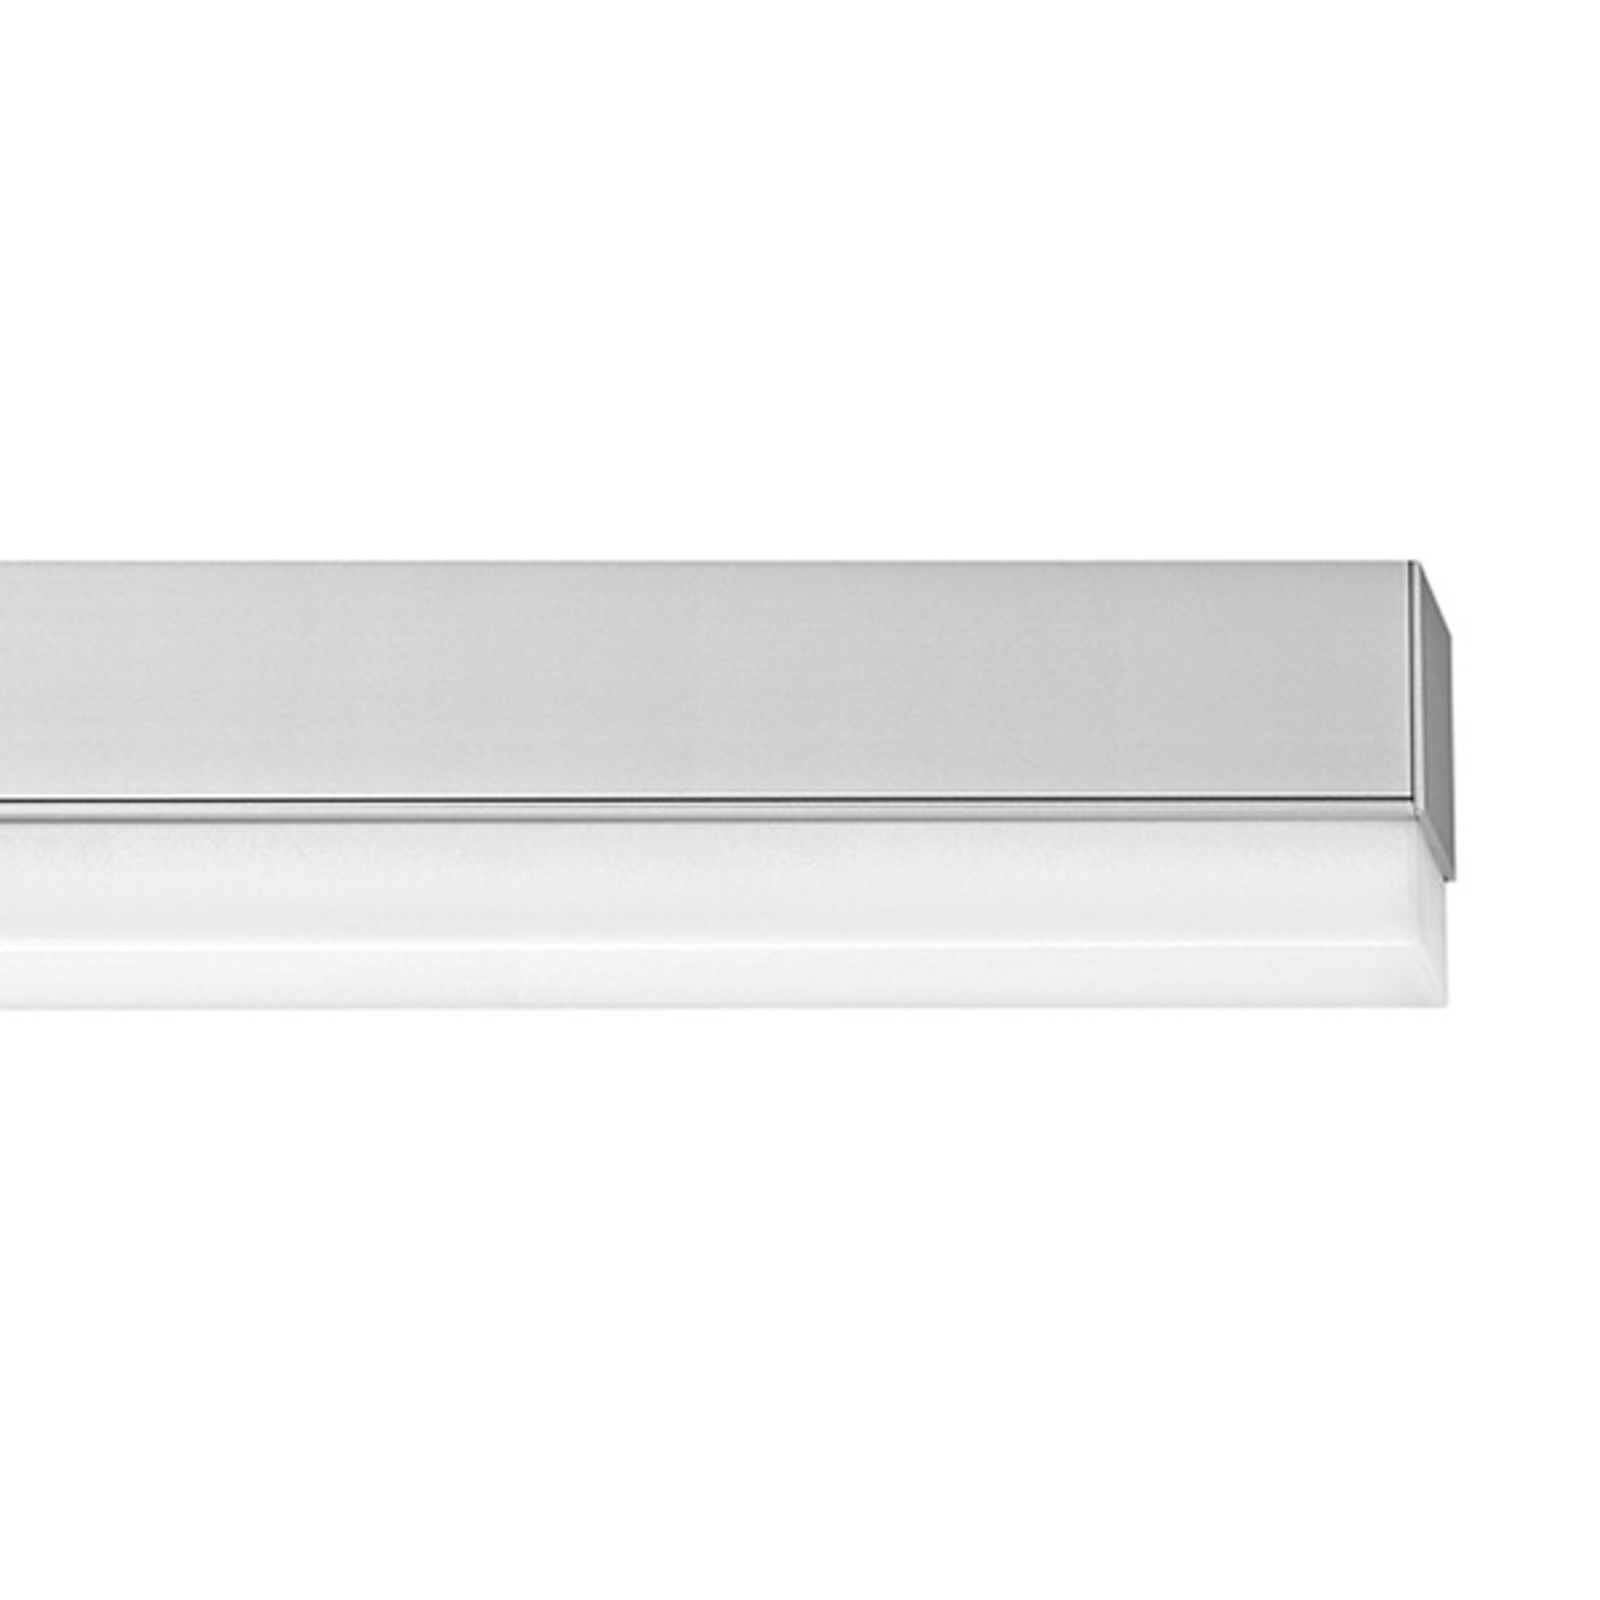 Ribag Metron LED-Deckenlampe 60cm ww alu dimmbar